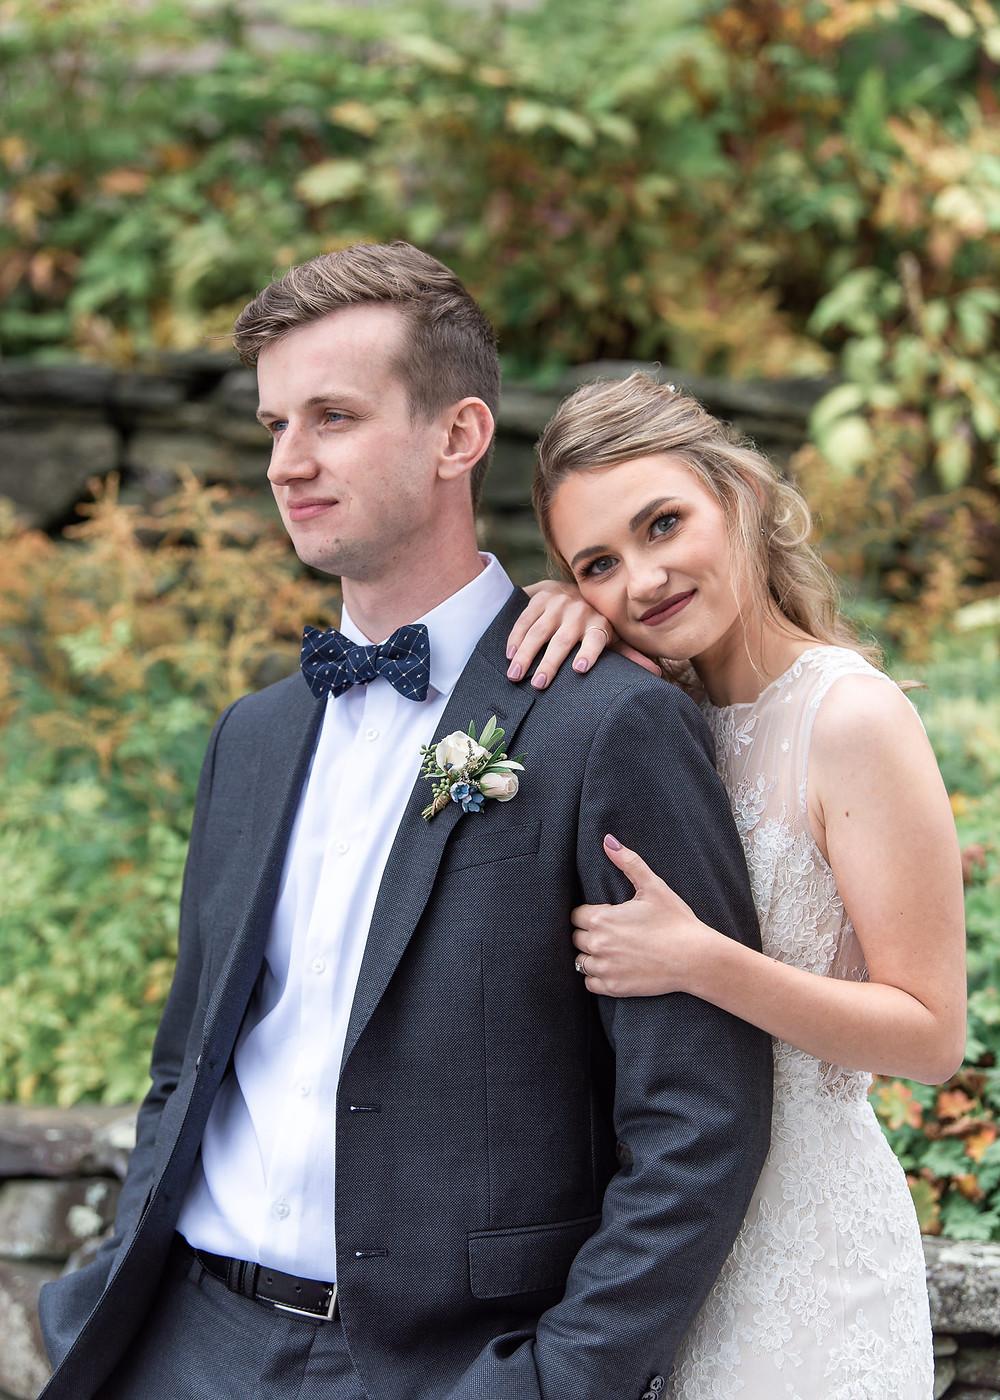 Maine fall wedding at Beech Hill Barn